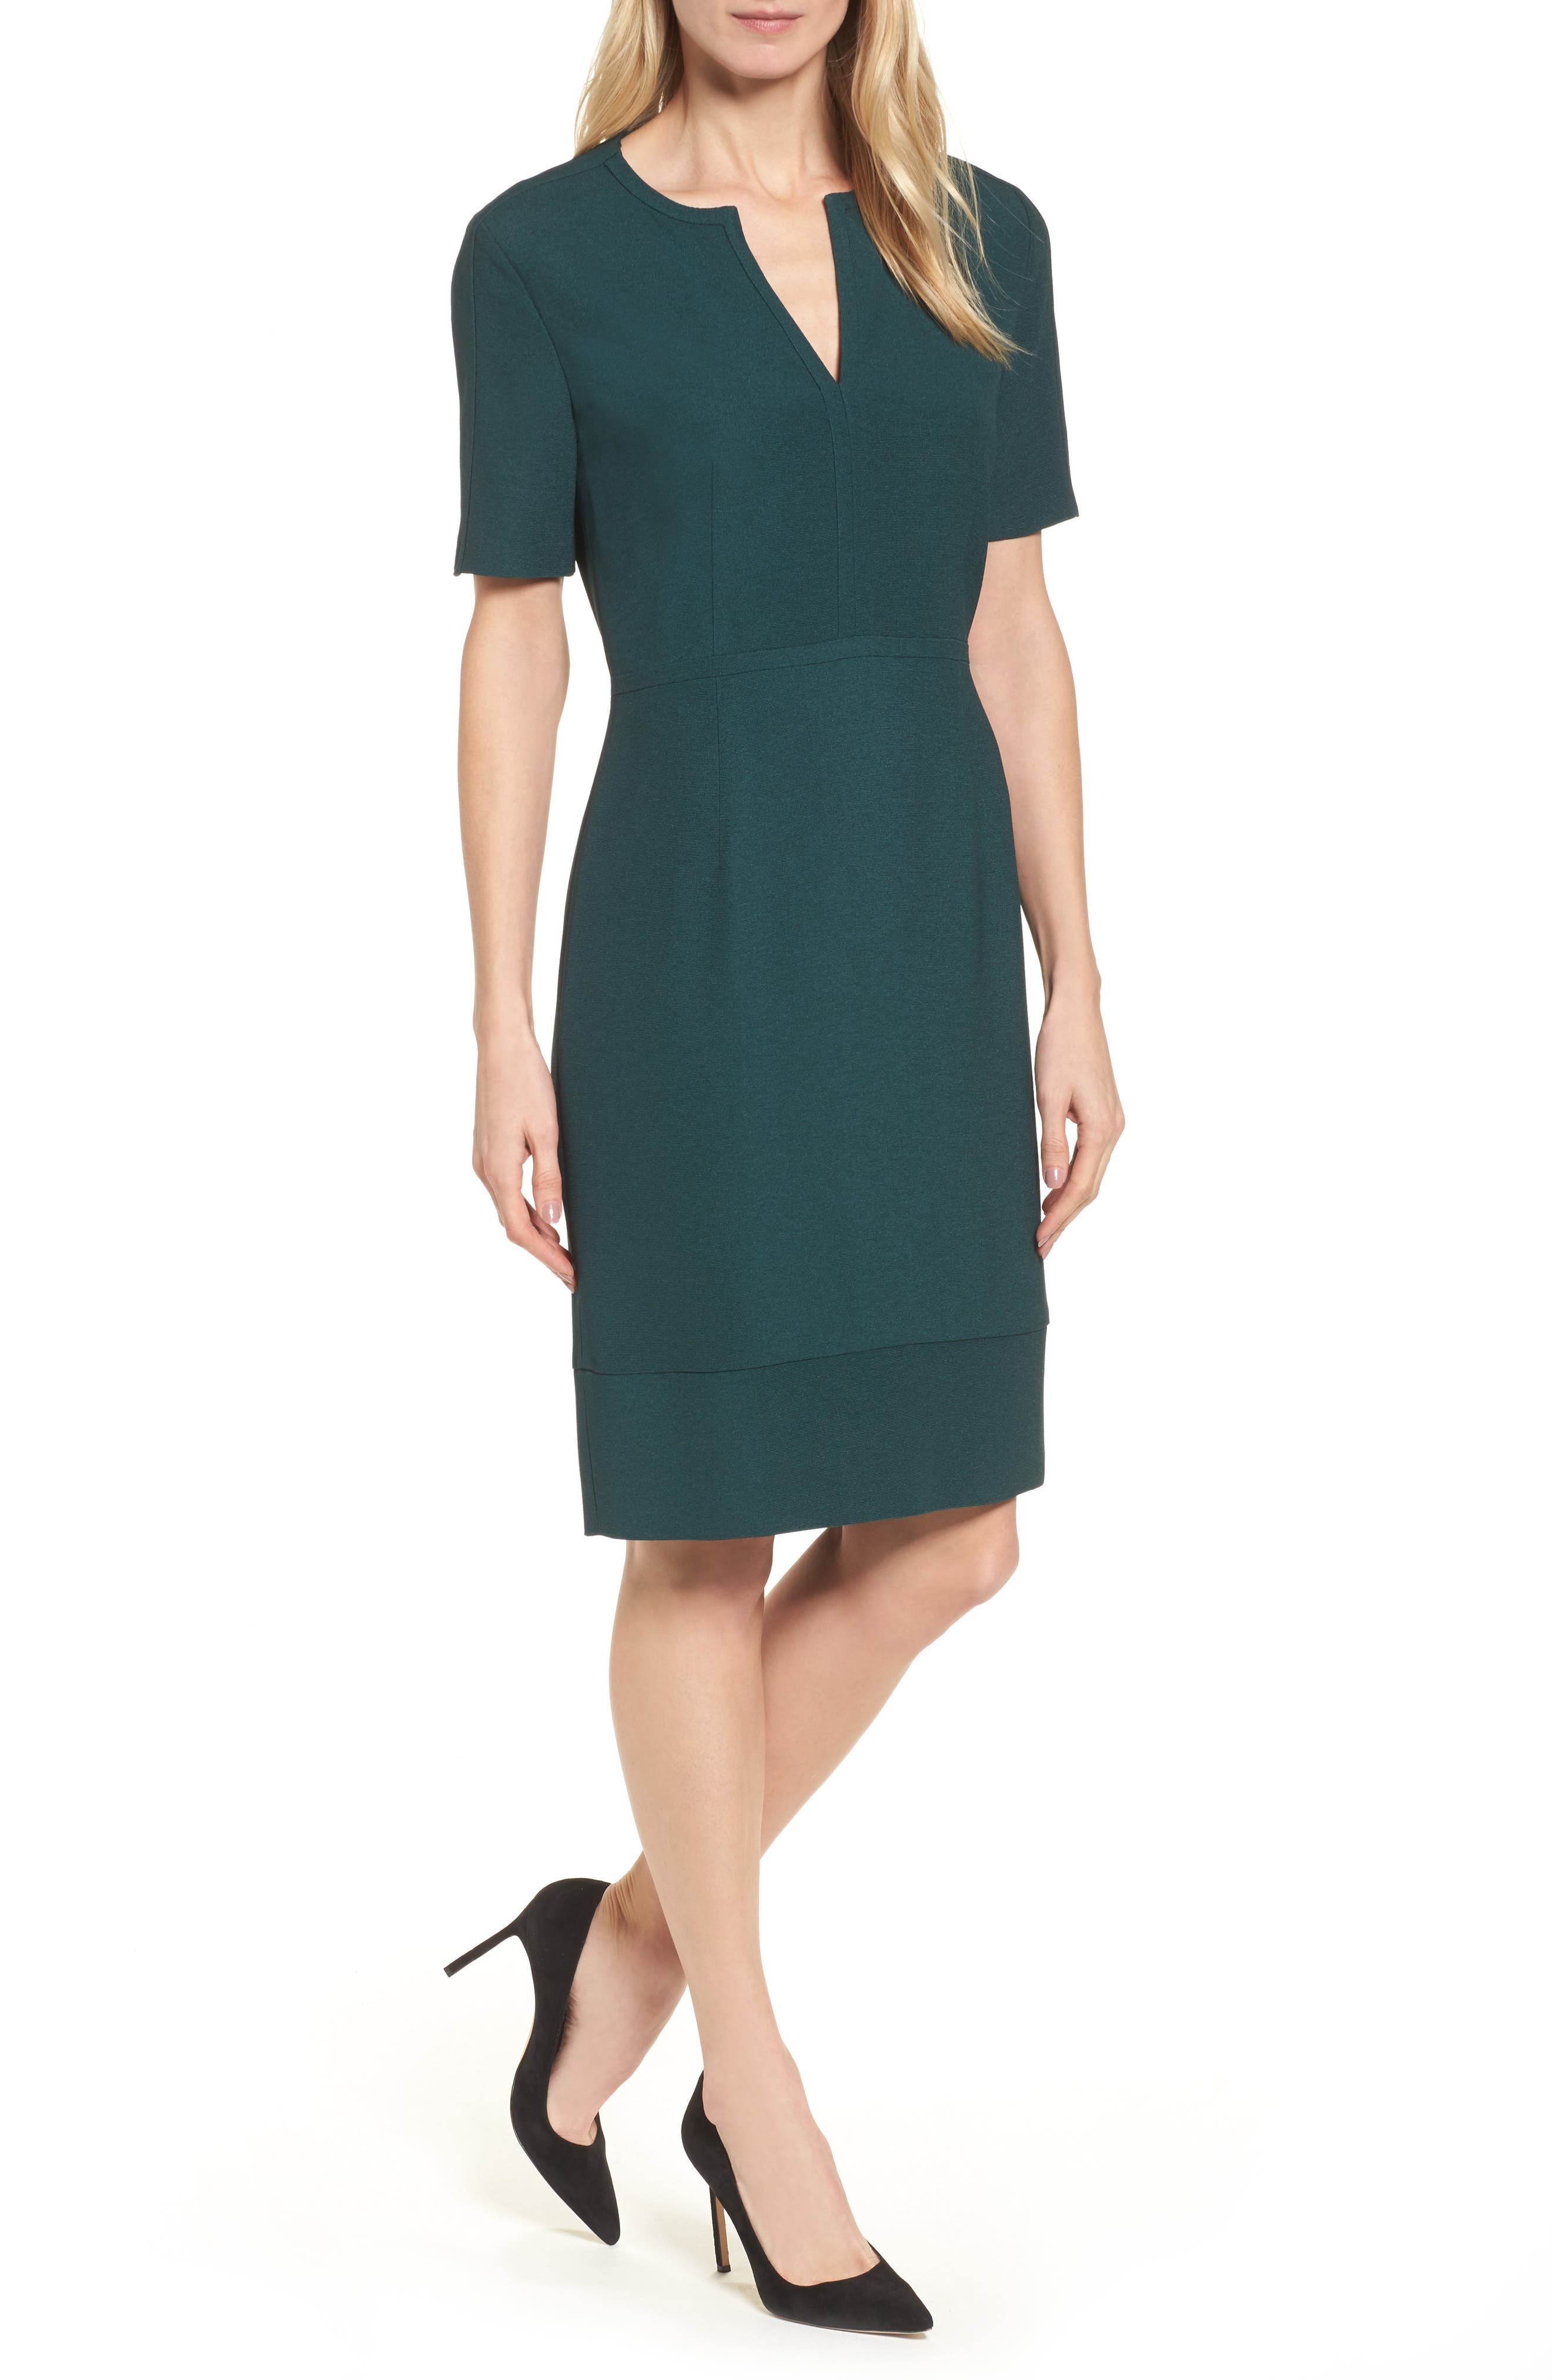 Dalesana Sheath Dress,                             Main thumbnail 1, color,                             Peacock Green